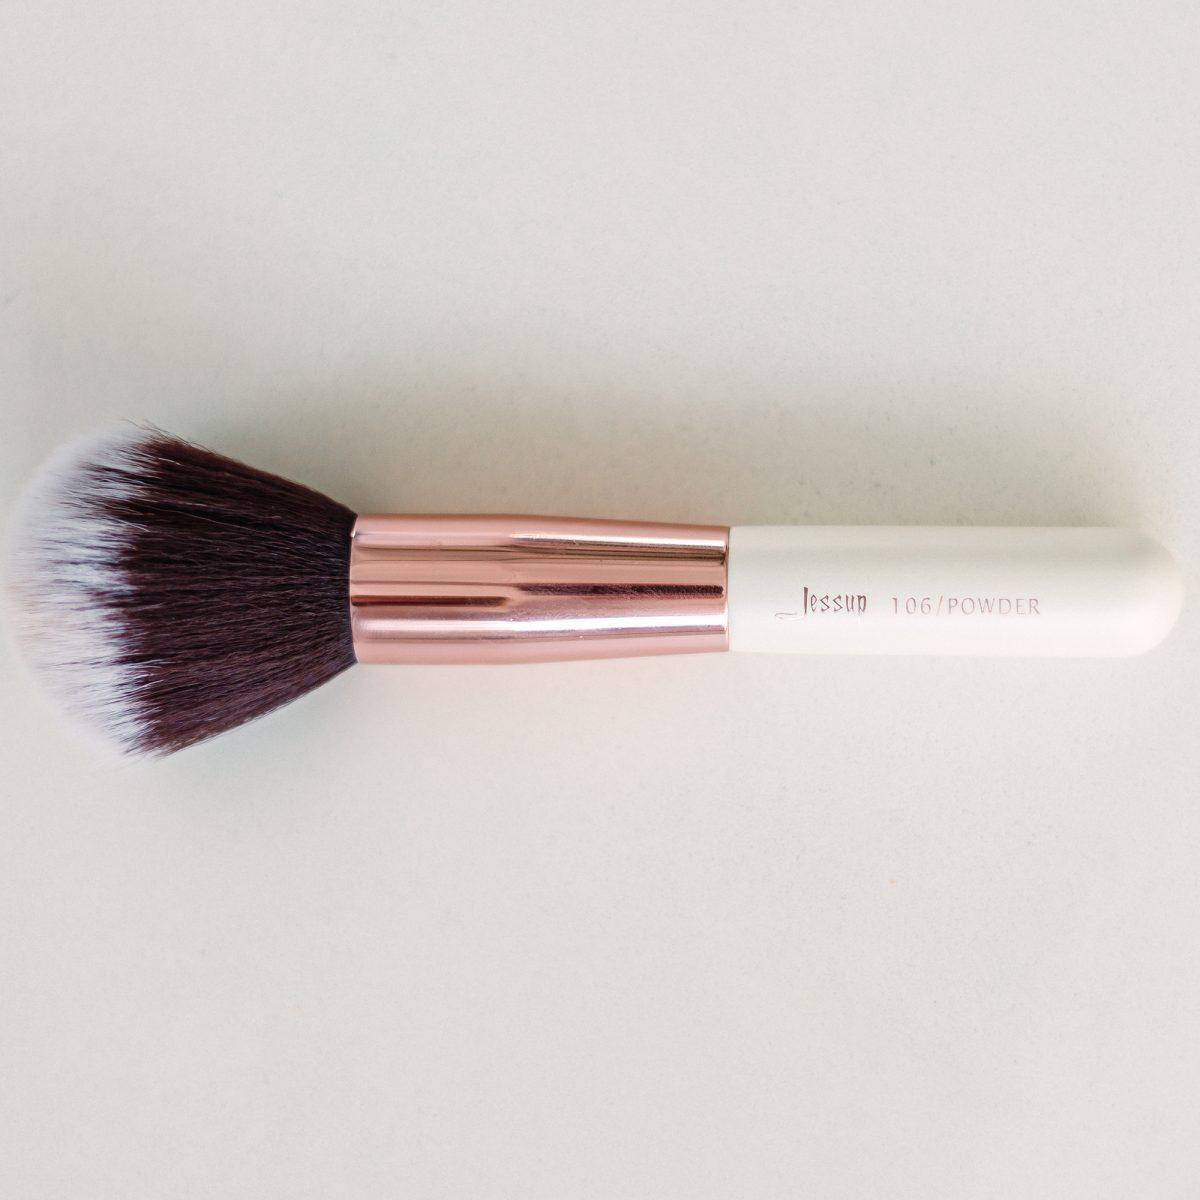 Makeup Brushes Guide - Jessup 106 Powder Brush